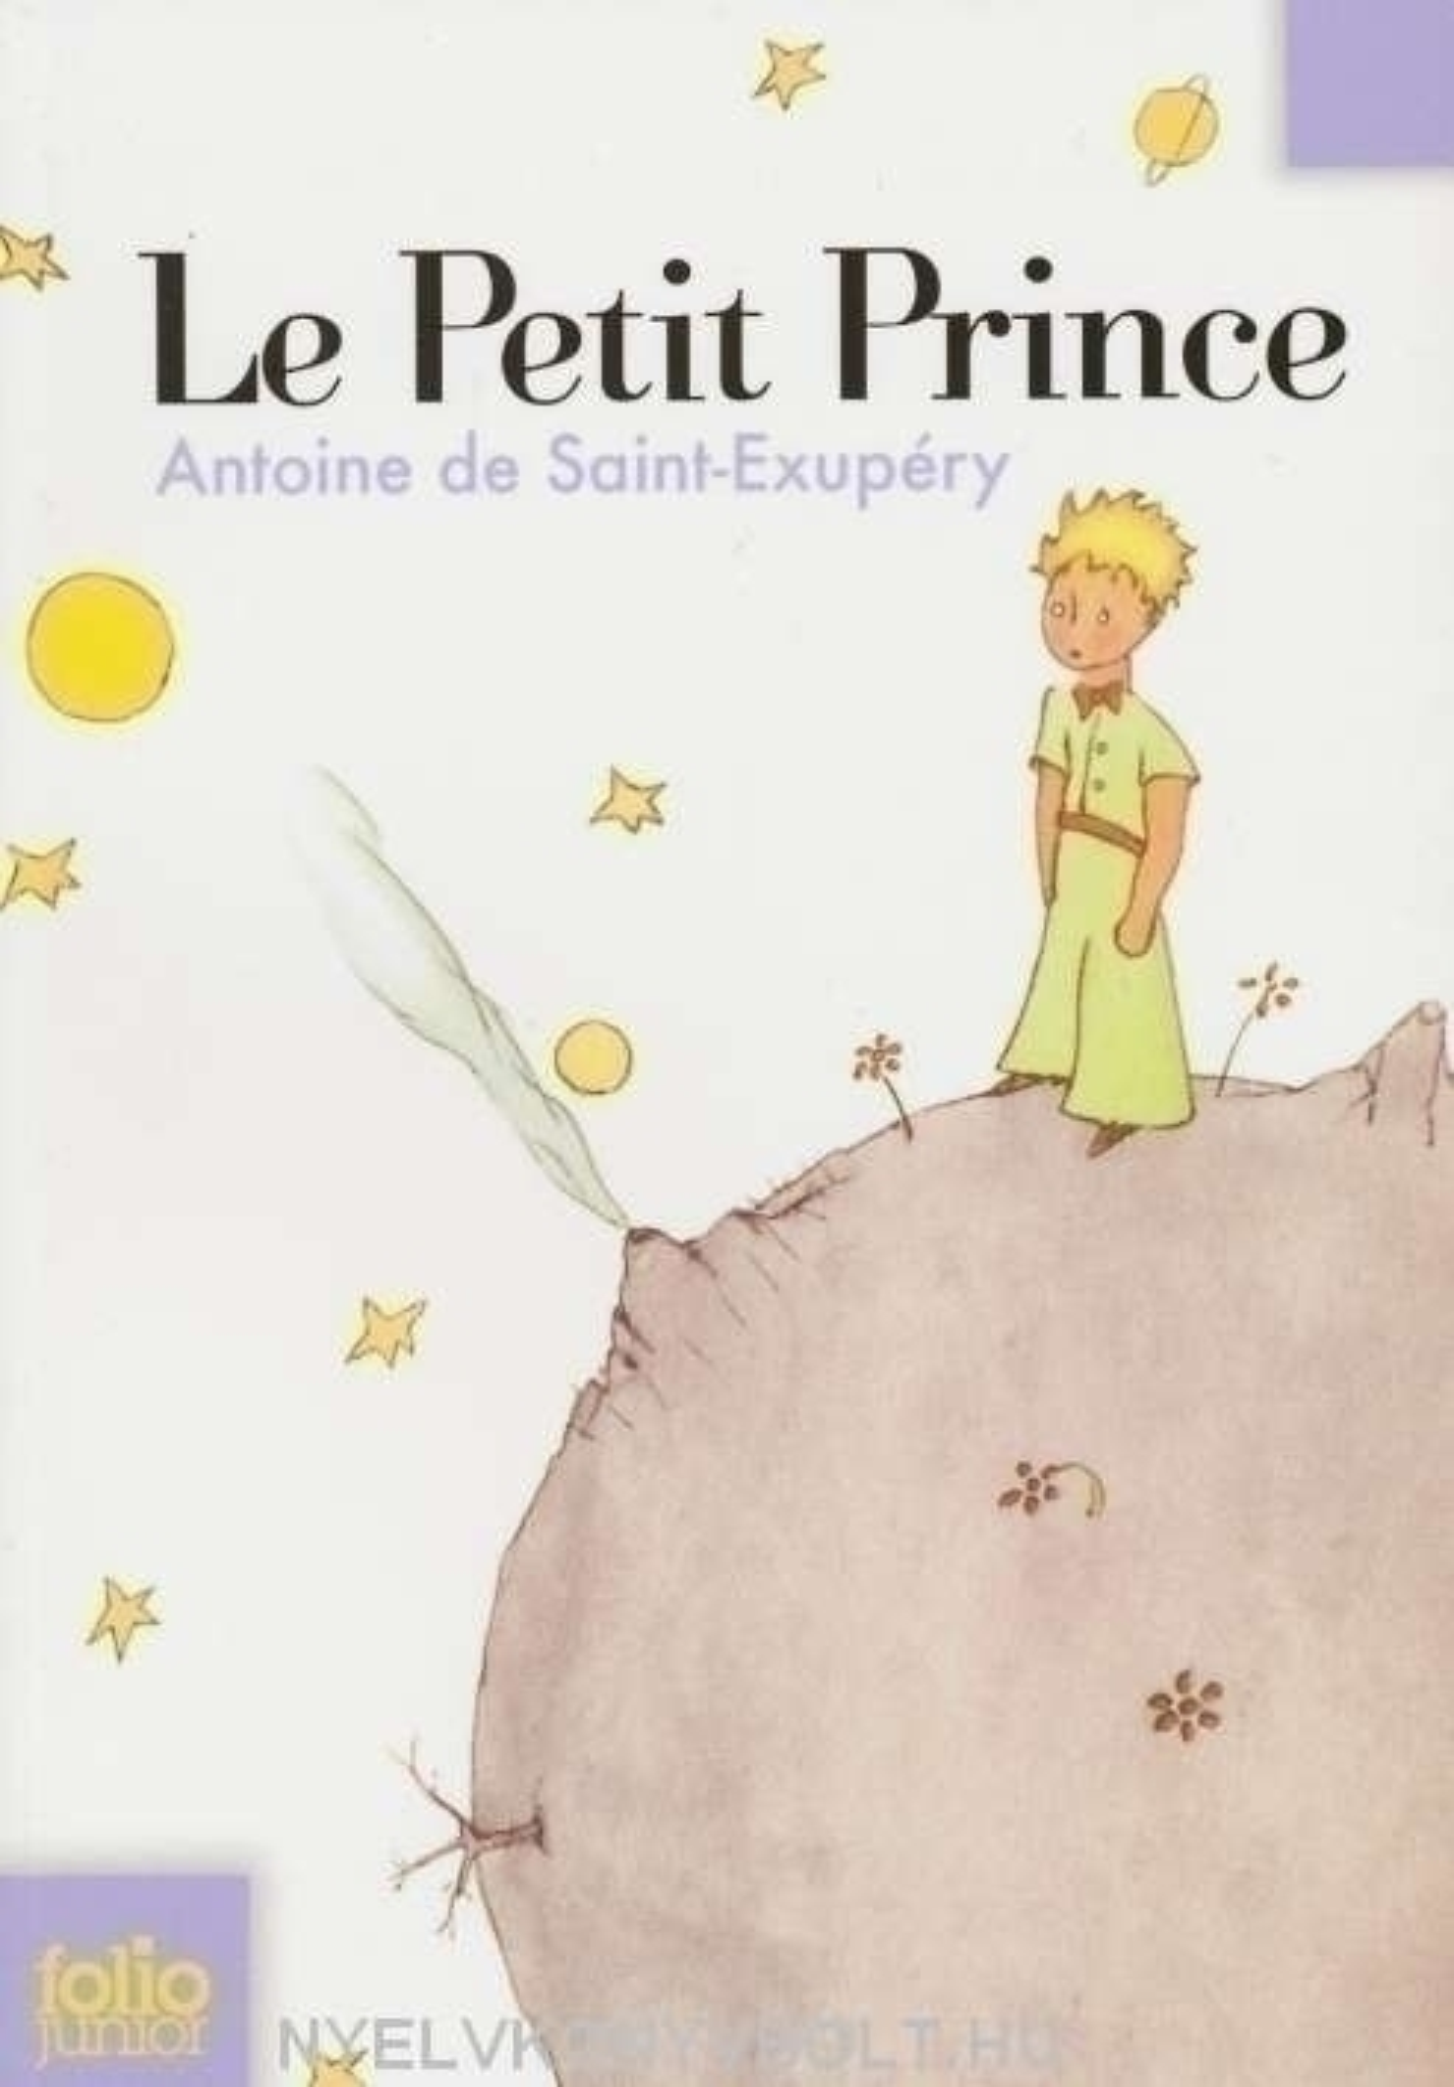 Antoine de Saint-Exupery: Le Petit Prince (A kis herceg francia eredetiben)